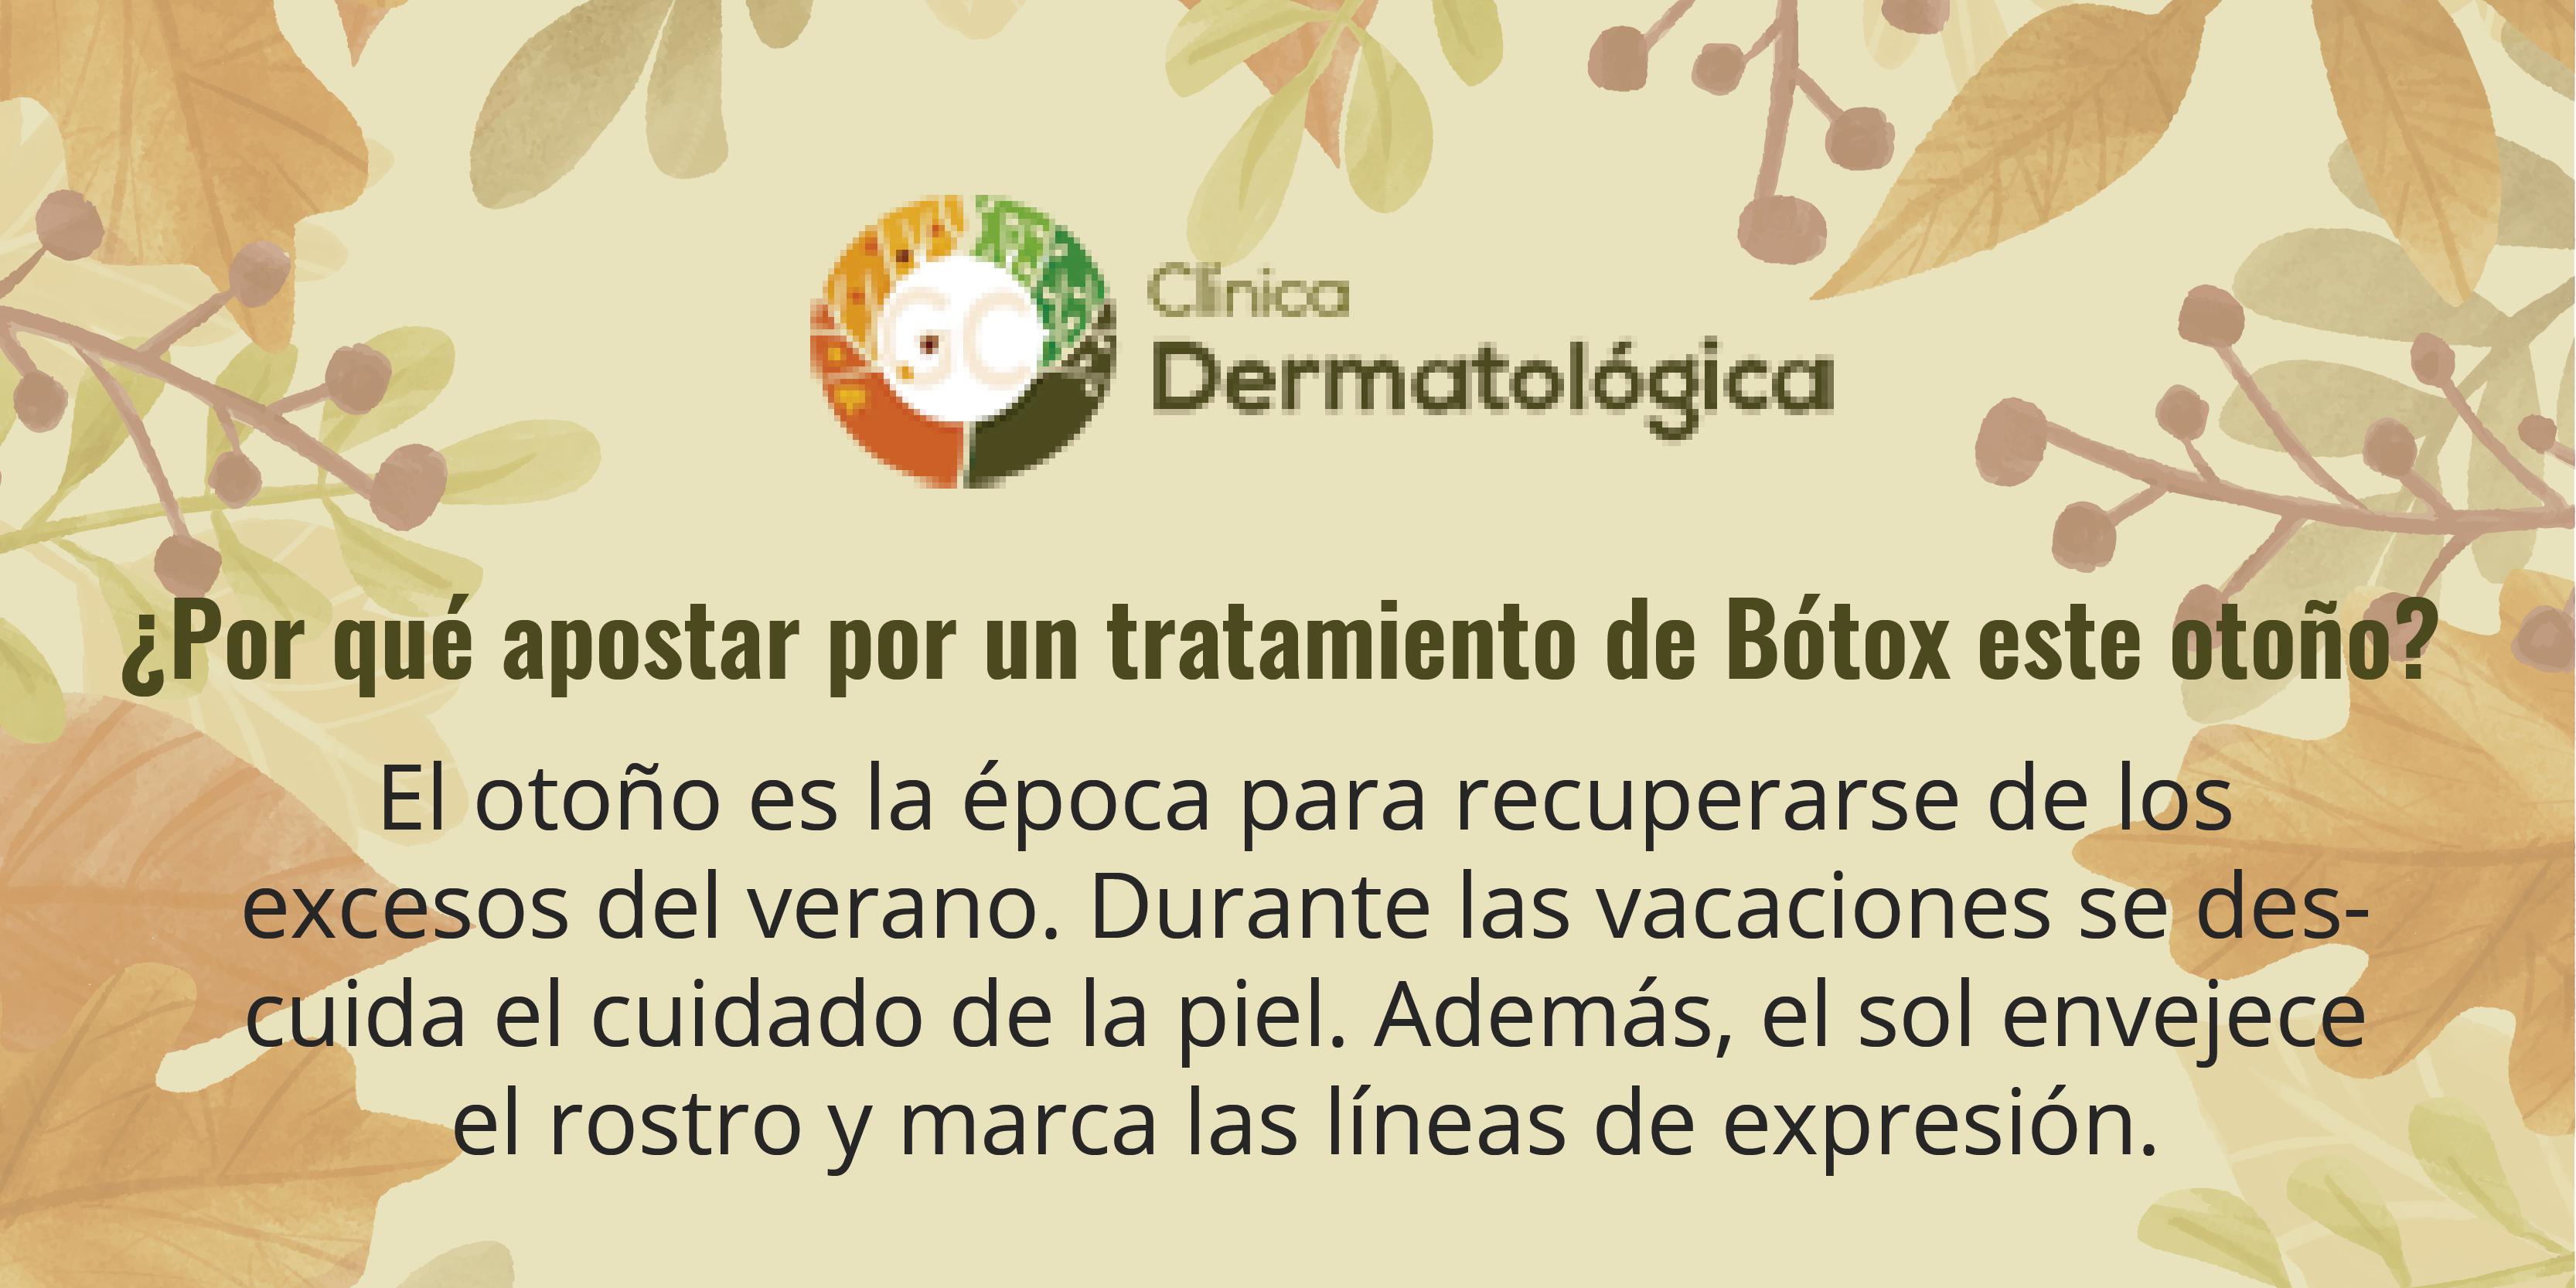 Clínica Dermatológica Madrid, Cavada